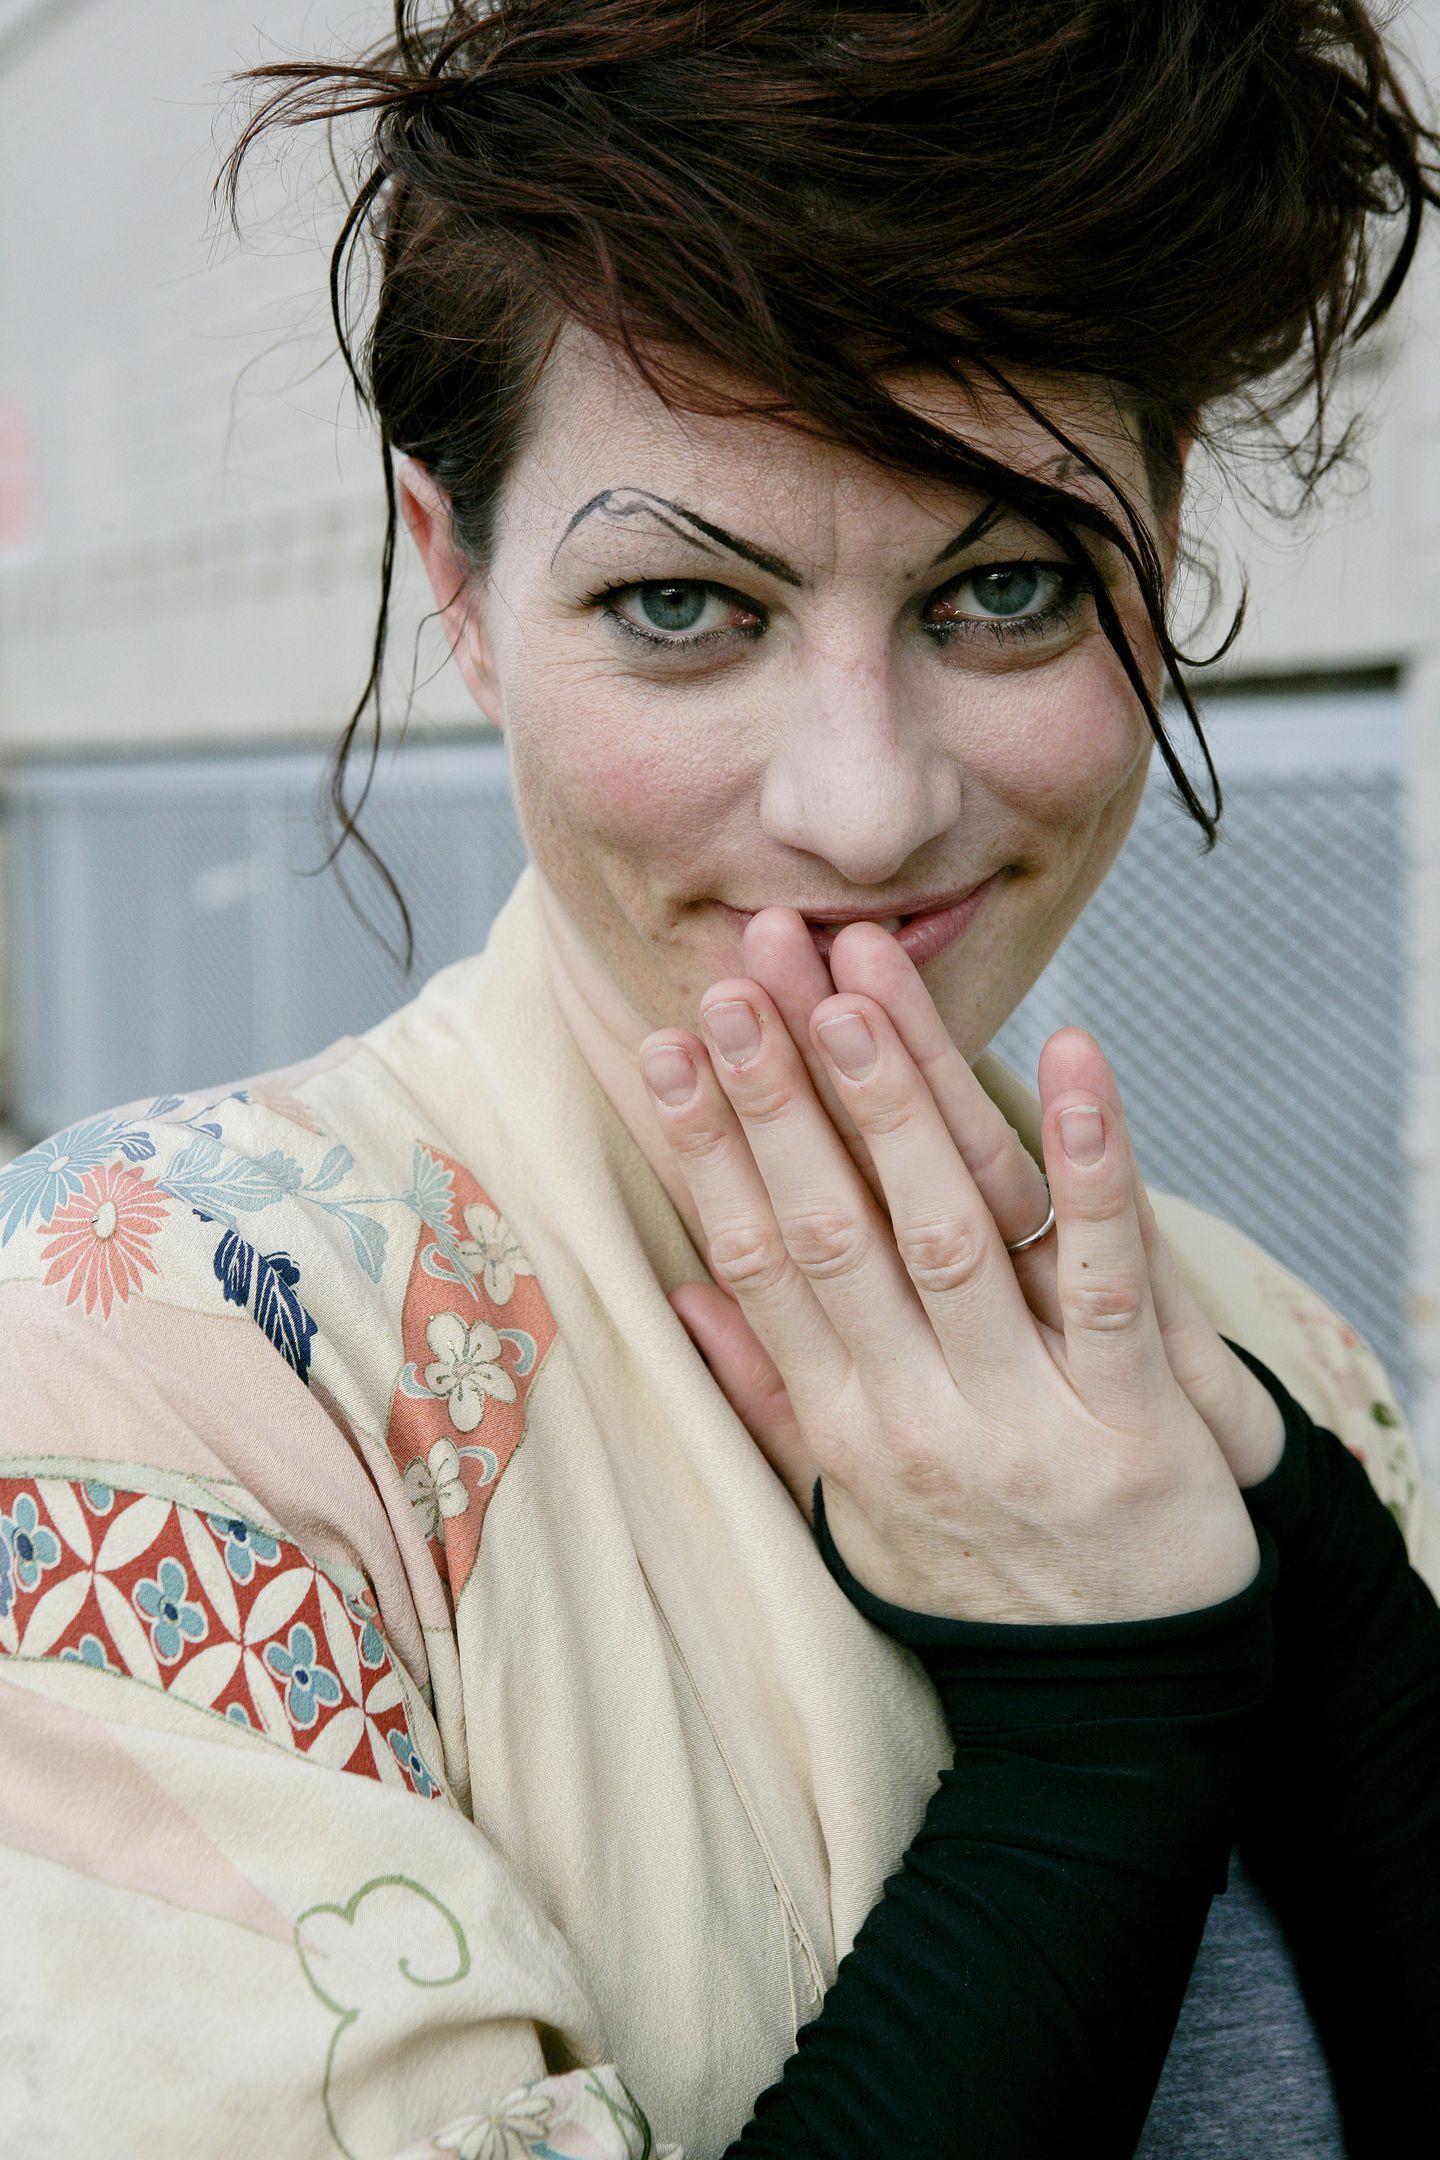 Amanda Palmer Images palmer, gaiman to play at dorchester art space benefit - the